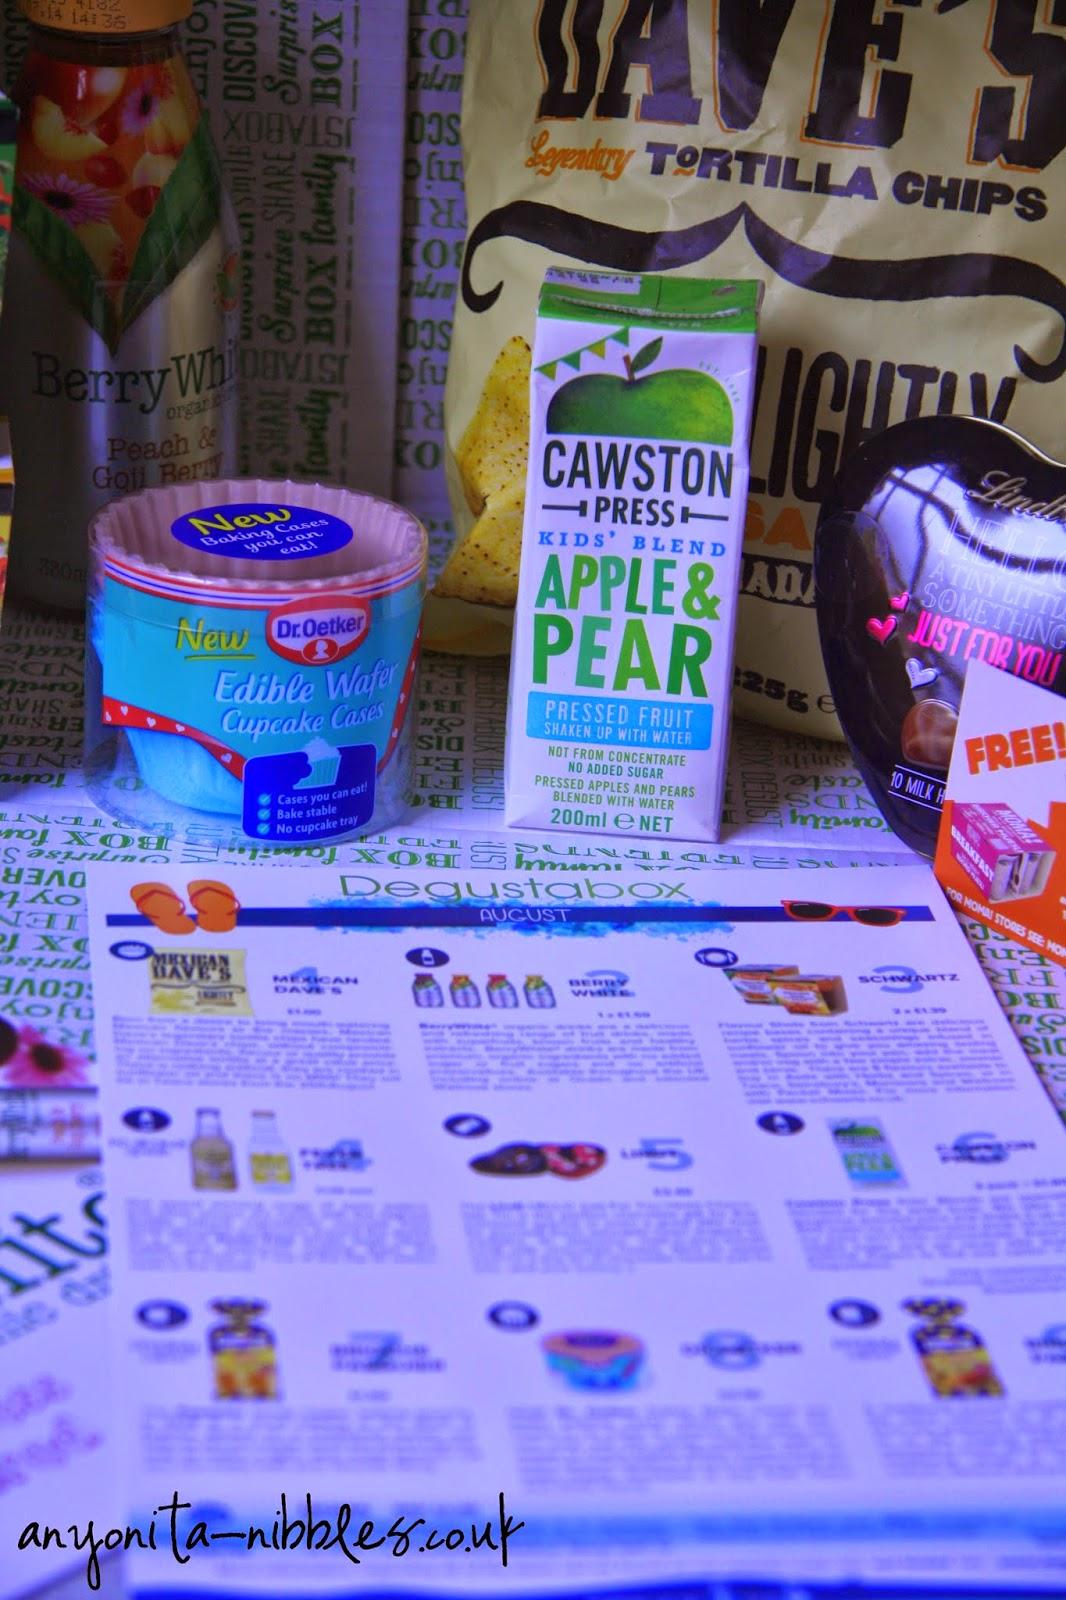 Degustabox ingredients with spec sheet | anyonita-nibbles.co.uk